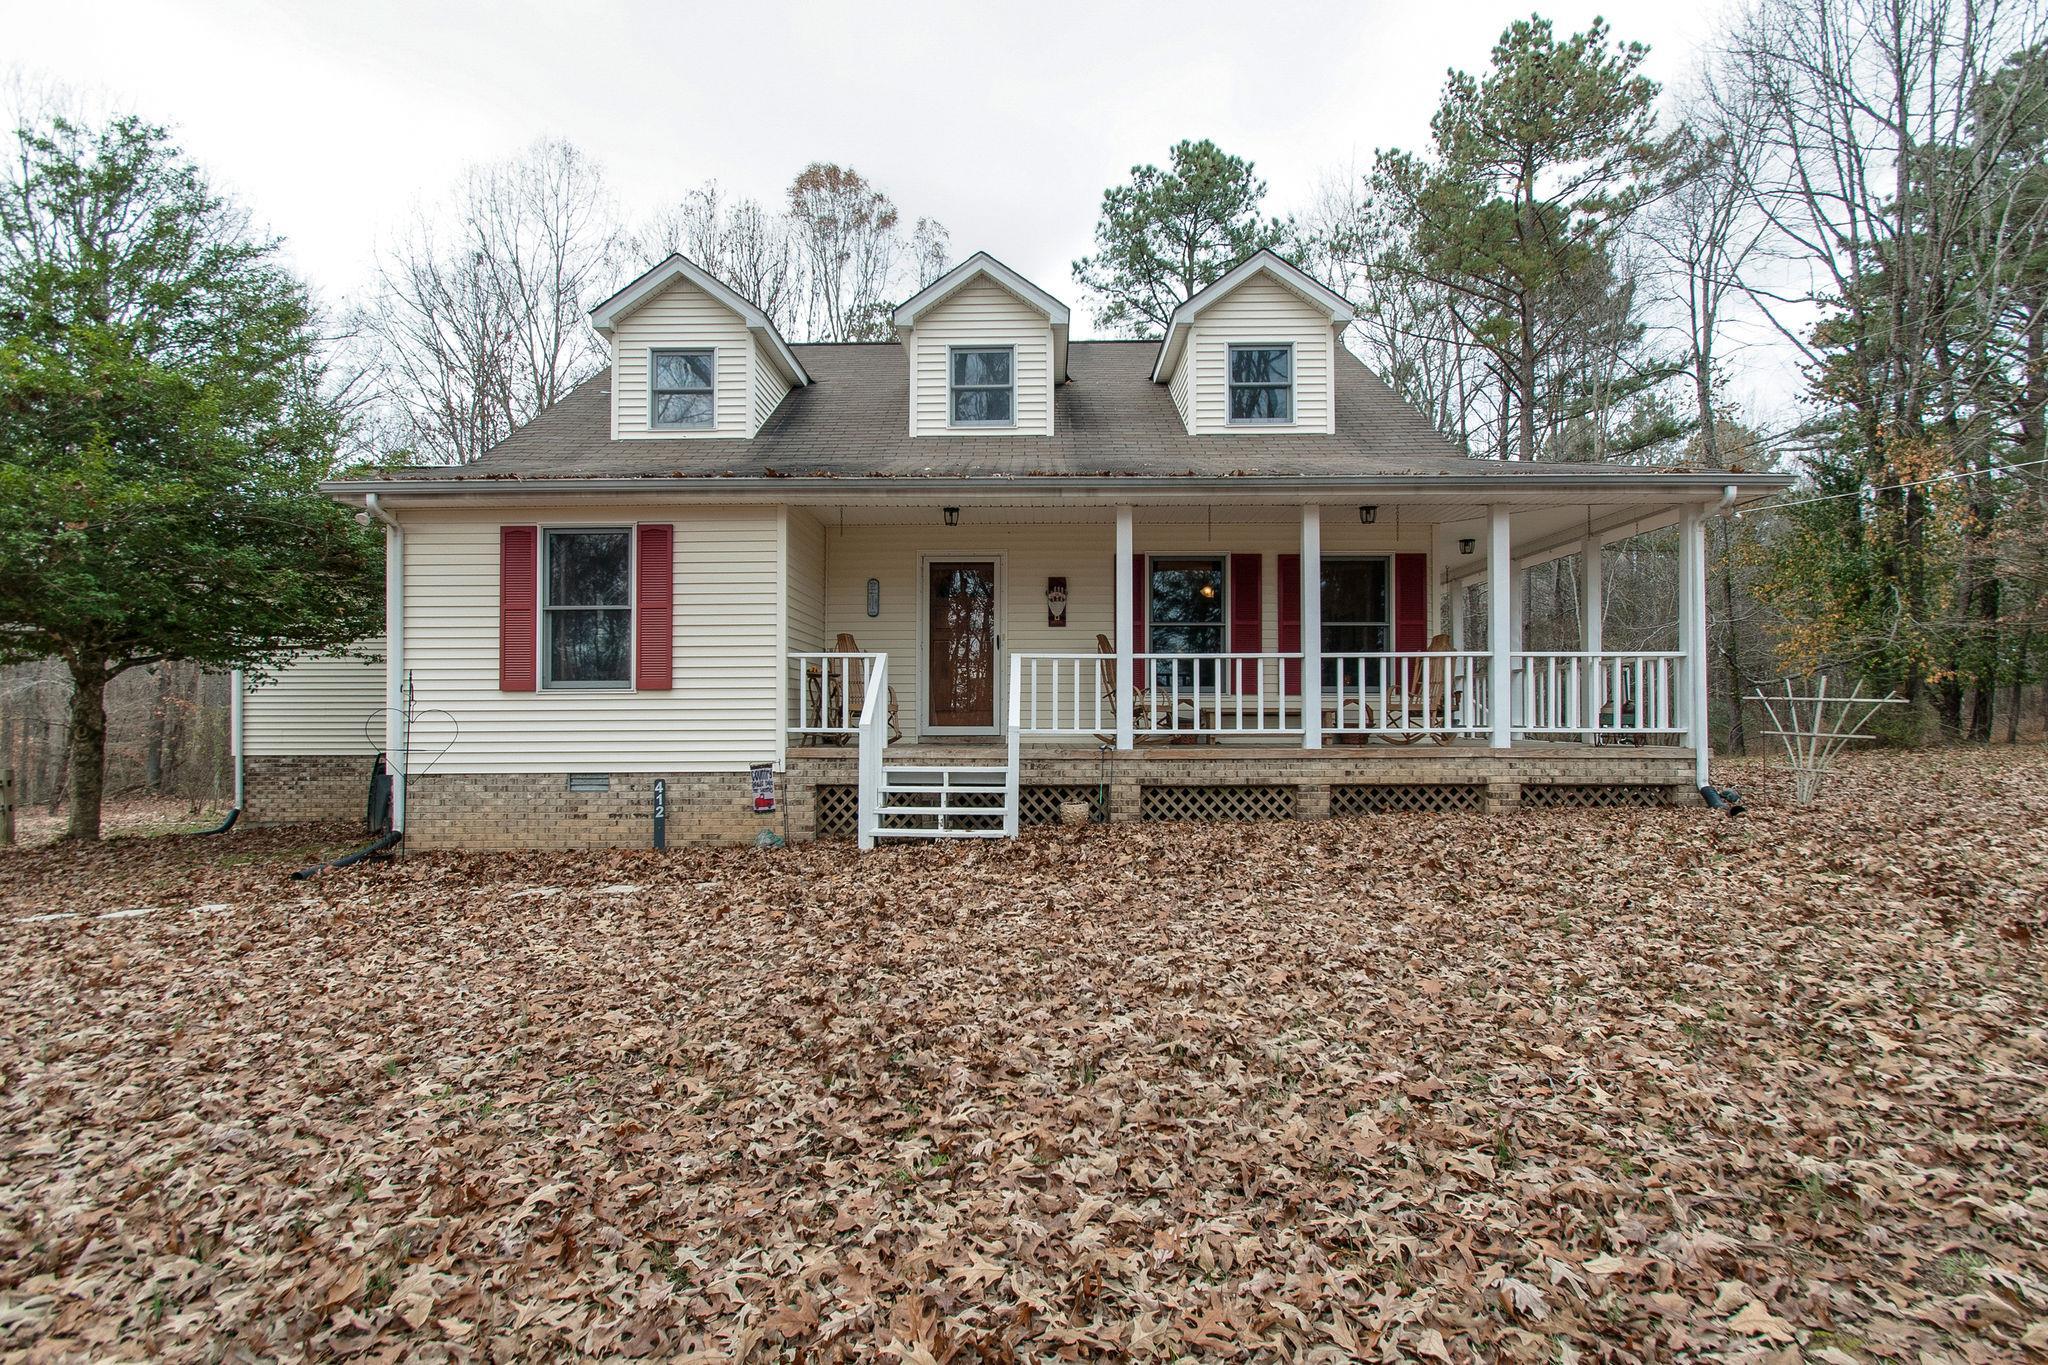 412 Kaiser Rd, Dickson, TN 37055 - Dickson, TN real estate listing